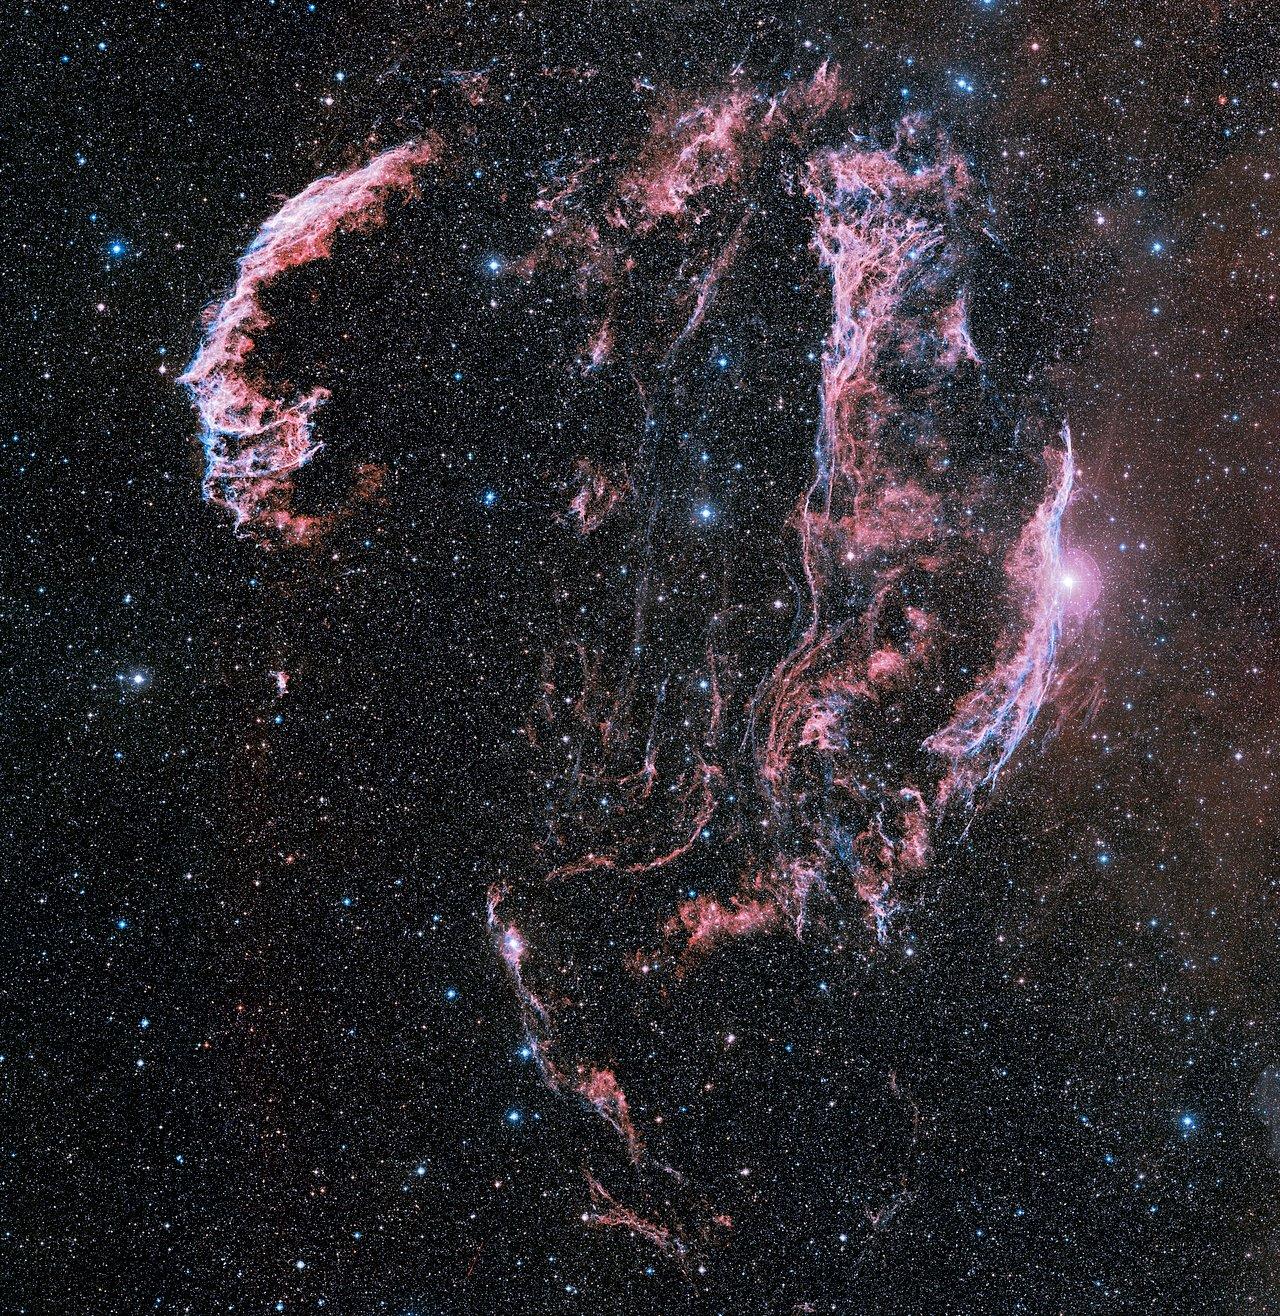 Wide-field ground-based astrophoto of the Veil Nebula